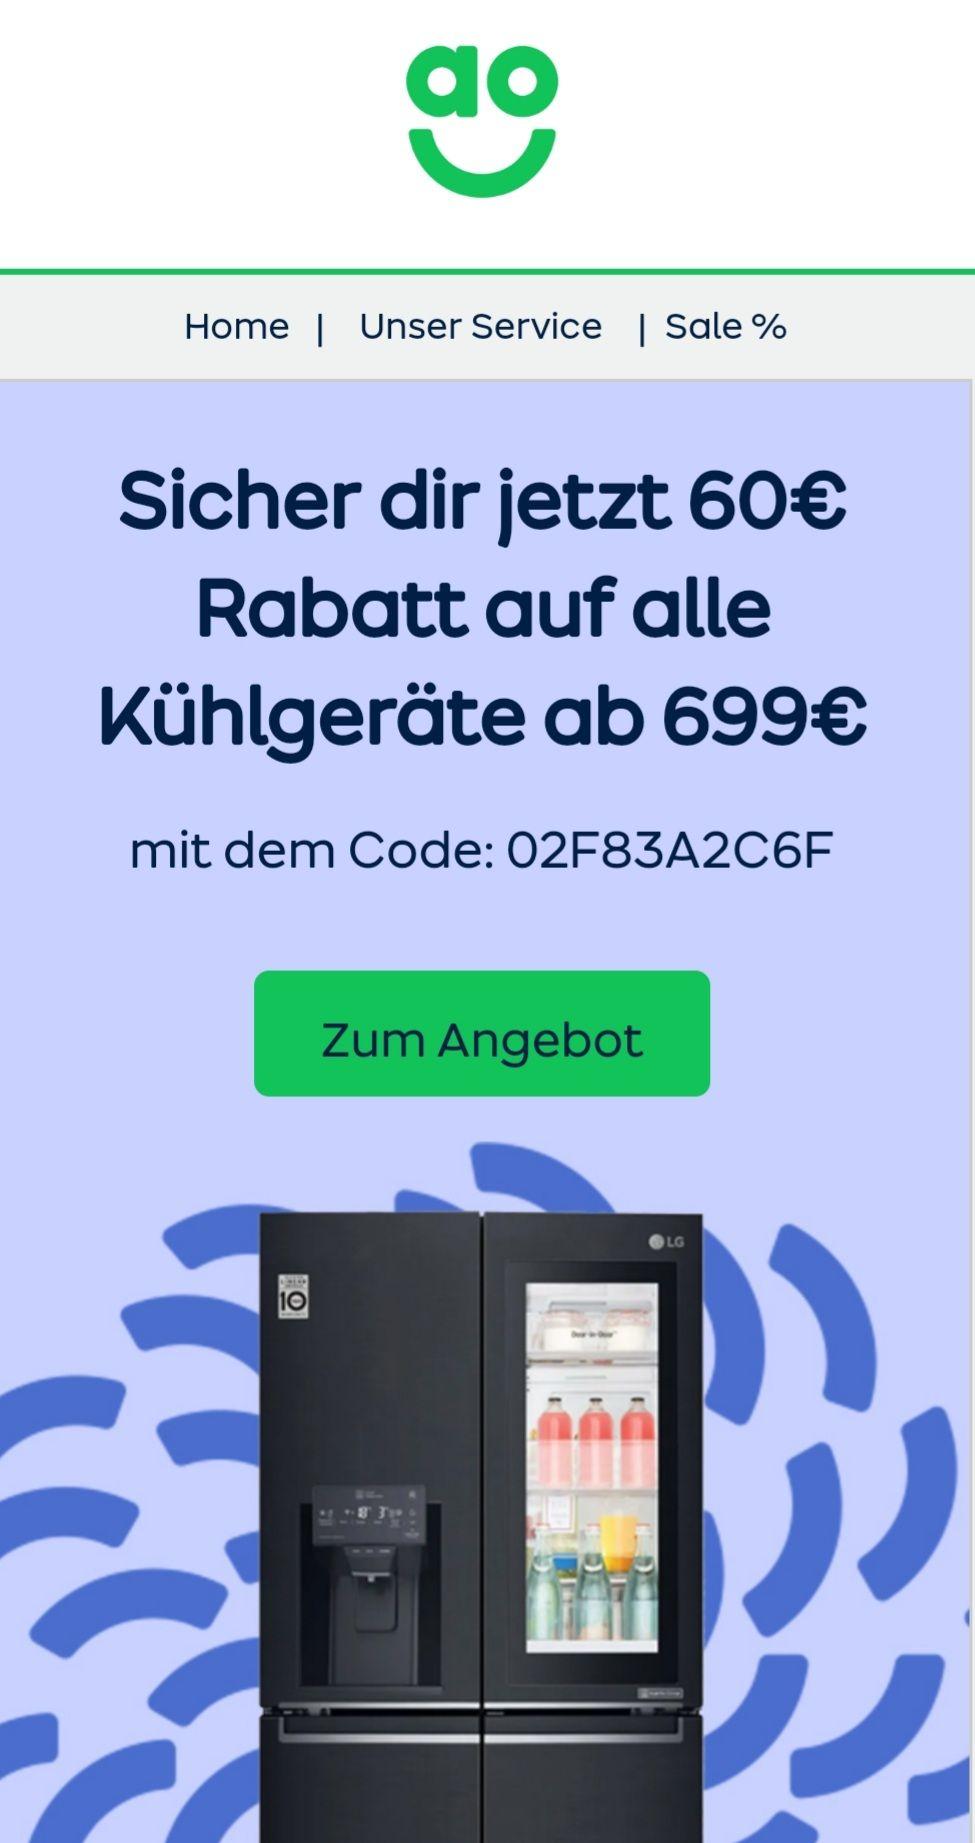 ao 60 Euro Rabatt auf alle Kühlgeräte ab 699 Euro